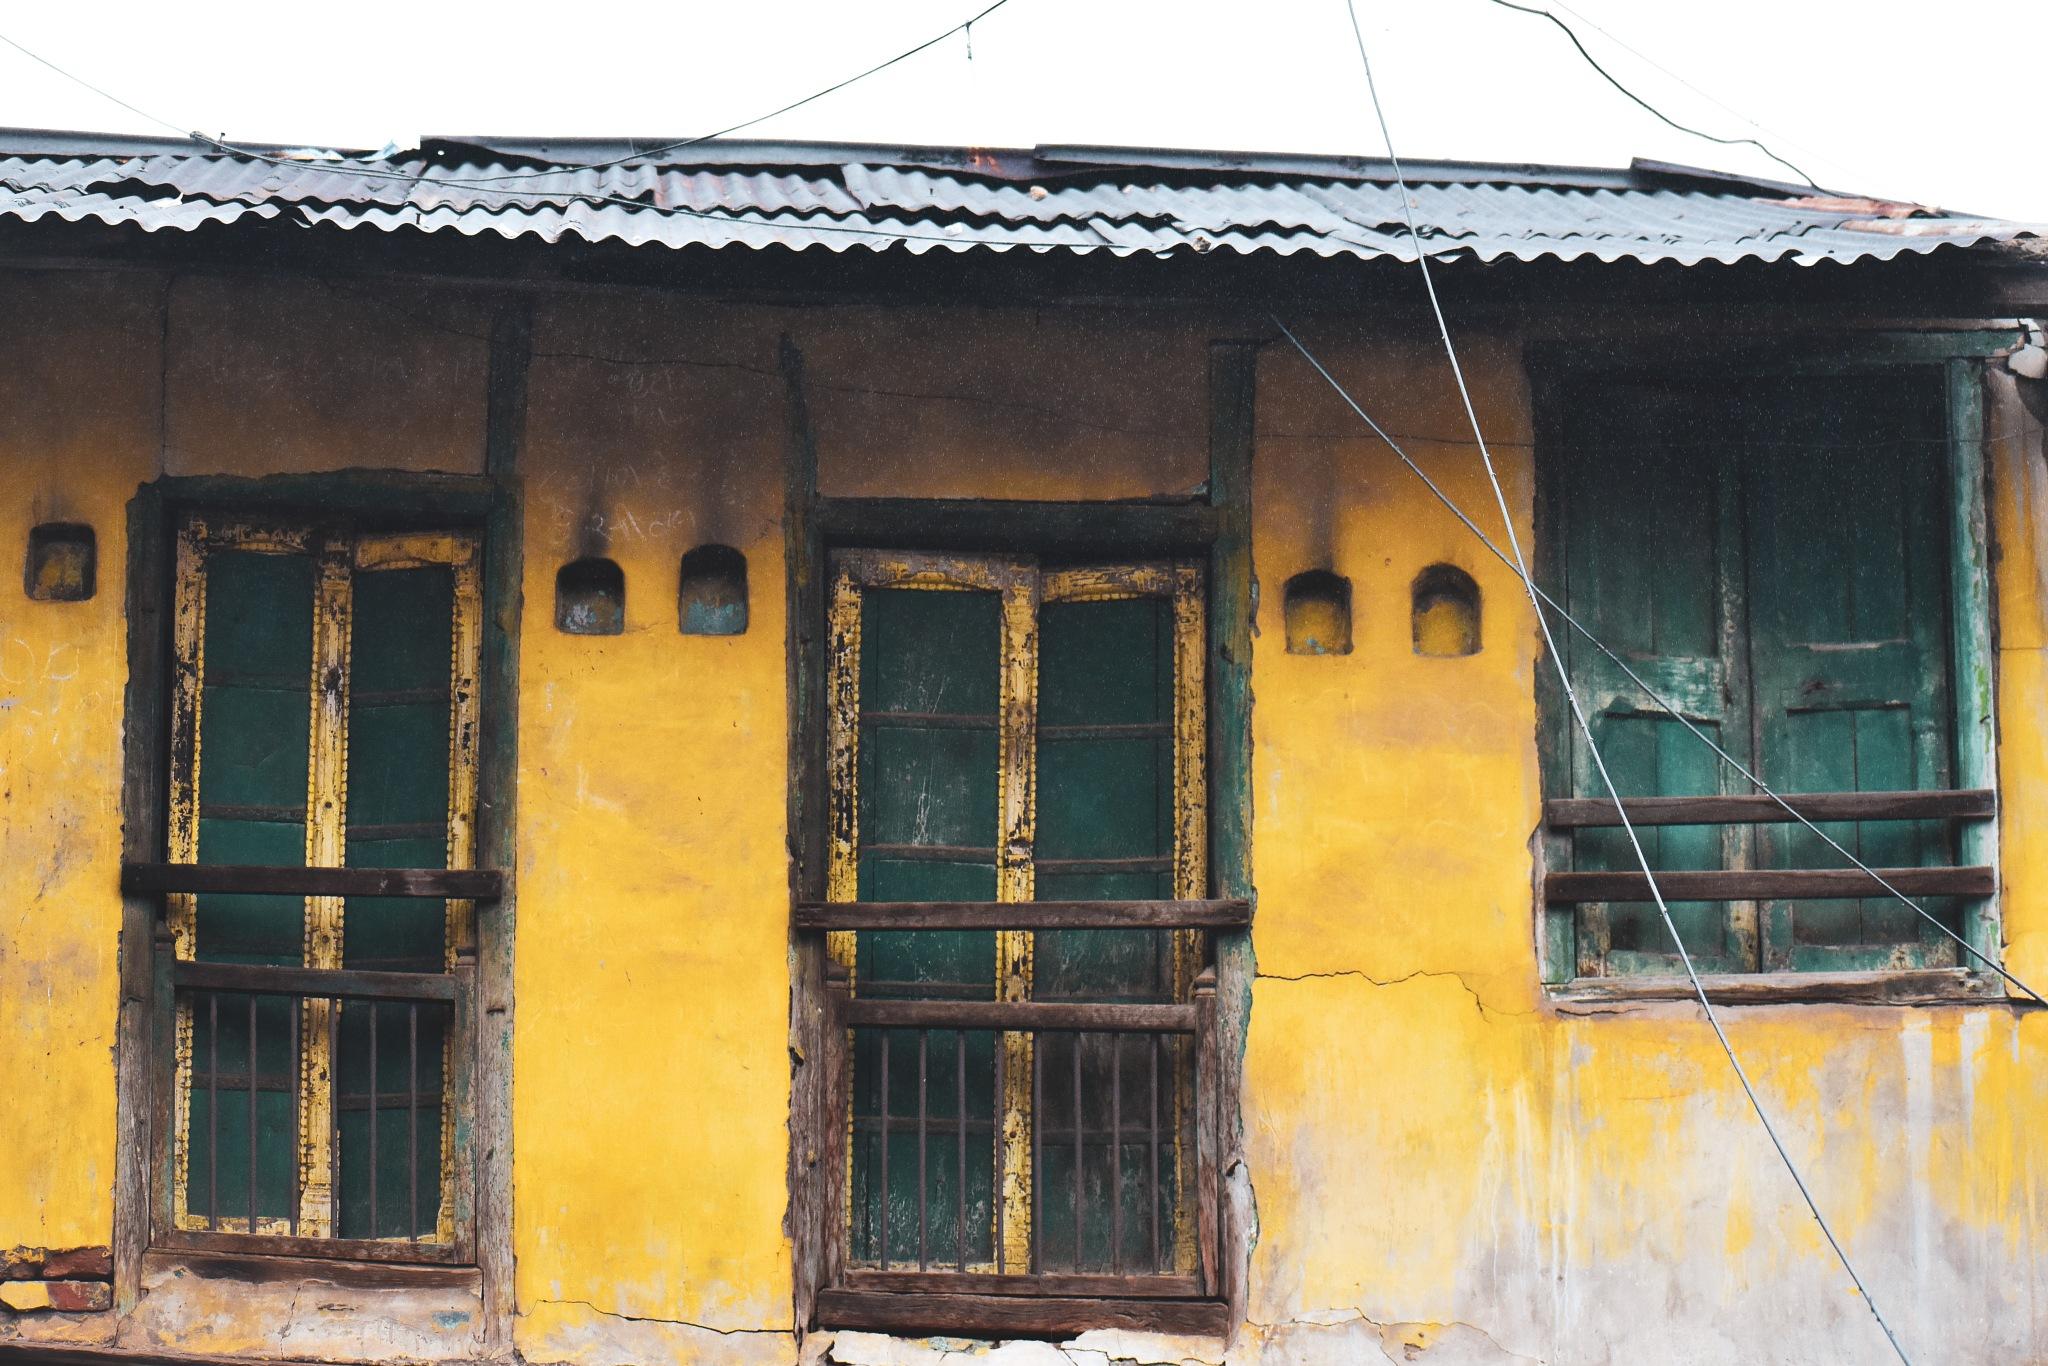 Windows & doors by Harsh Patel